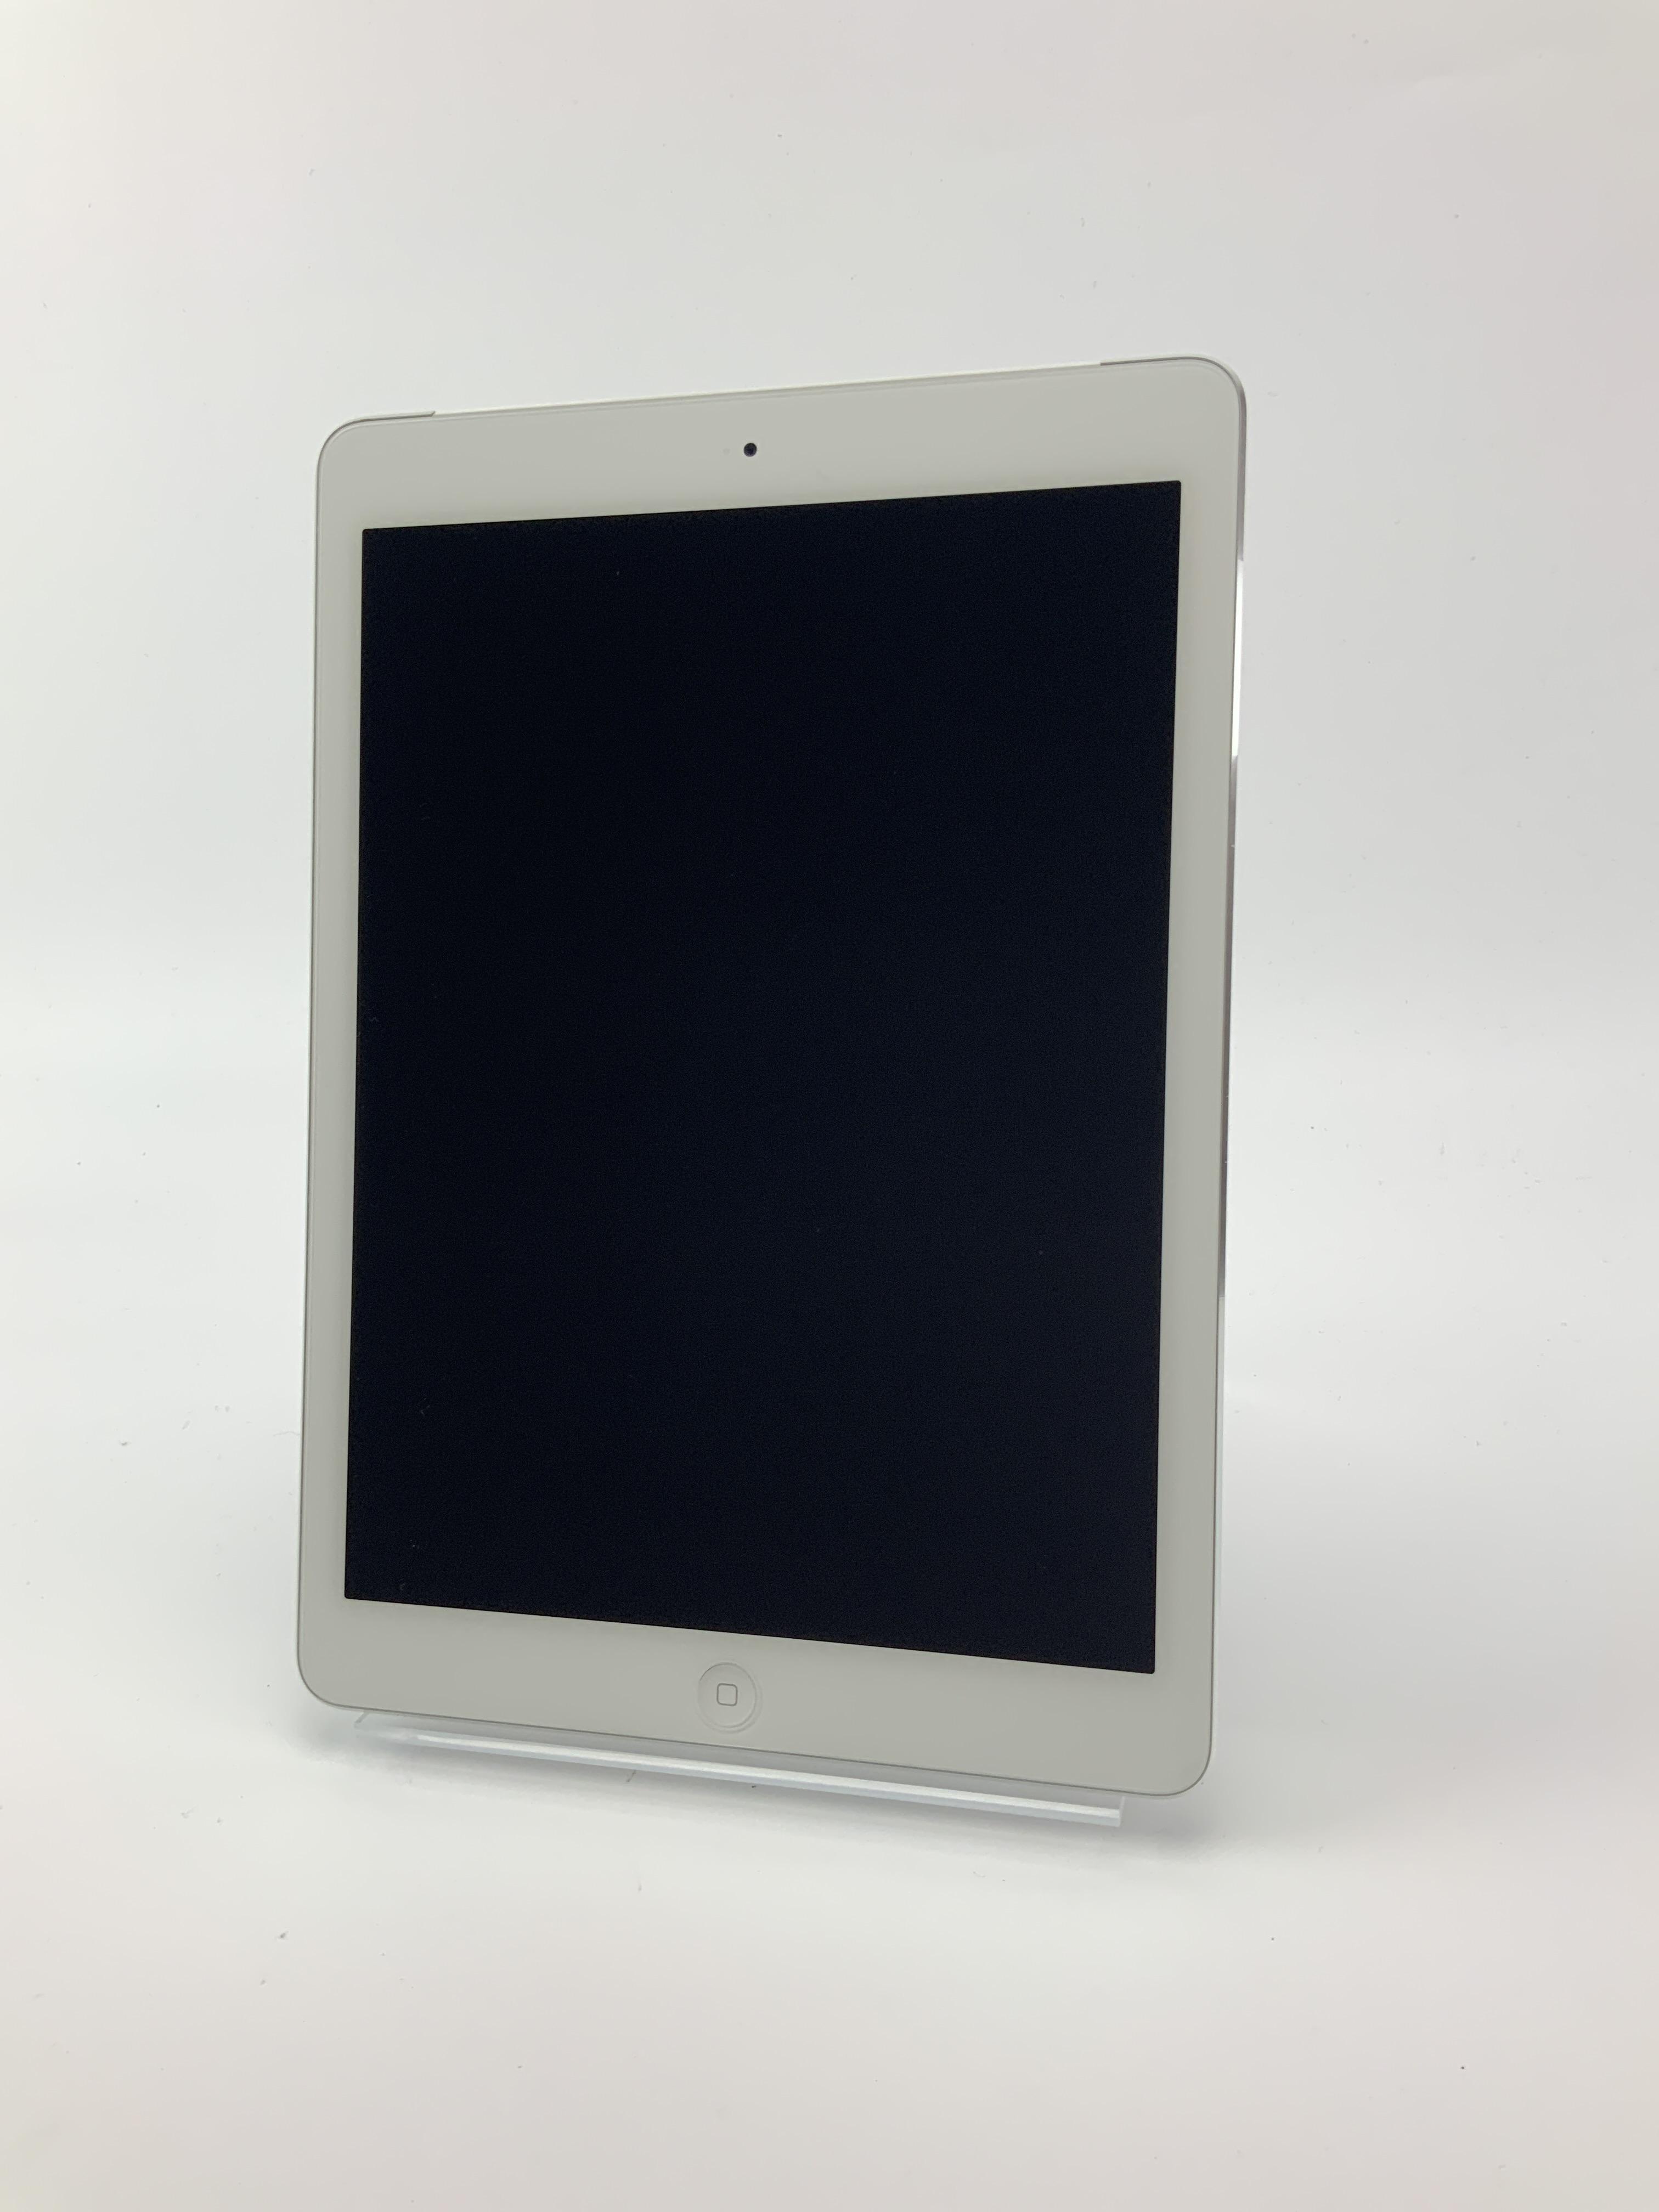 iPad Air 2 Wi-Fi + Cellular 32GB, 32GB, Silver, Afbeelding 1